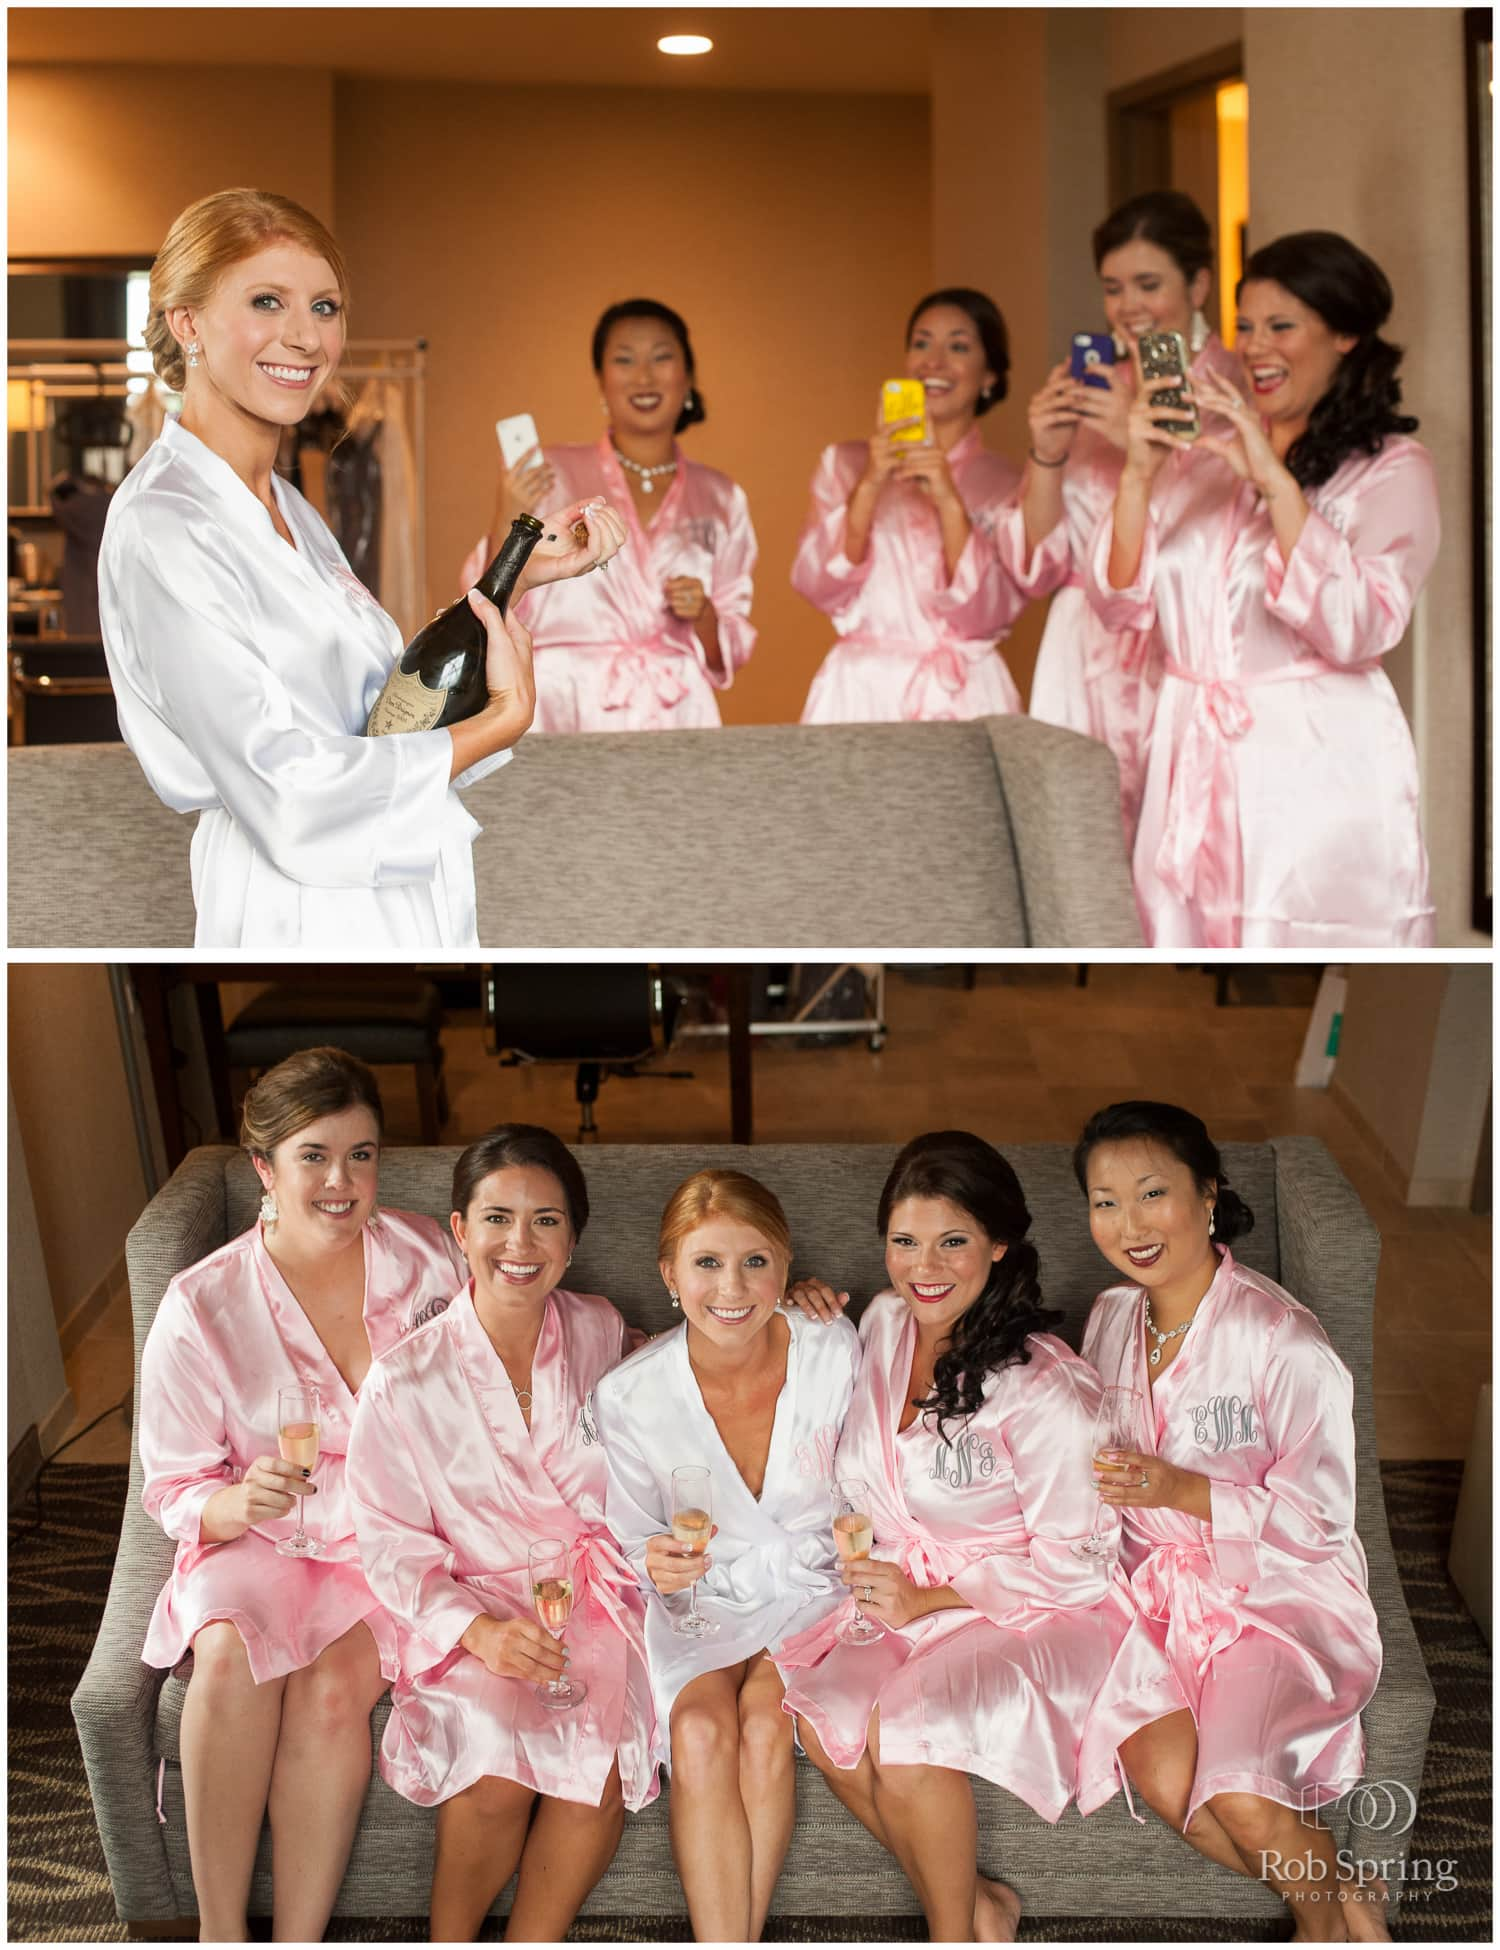 Bridesmaids with pink monogrammed robes, Saratoga Springs, NY Wedding photos